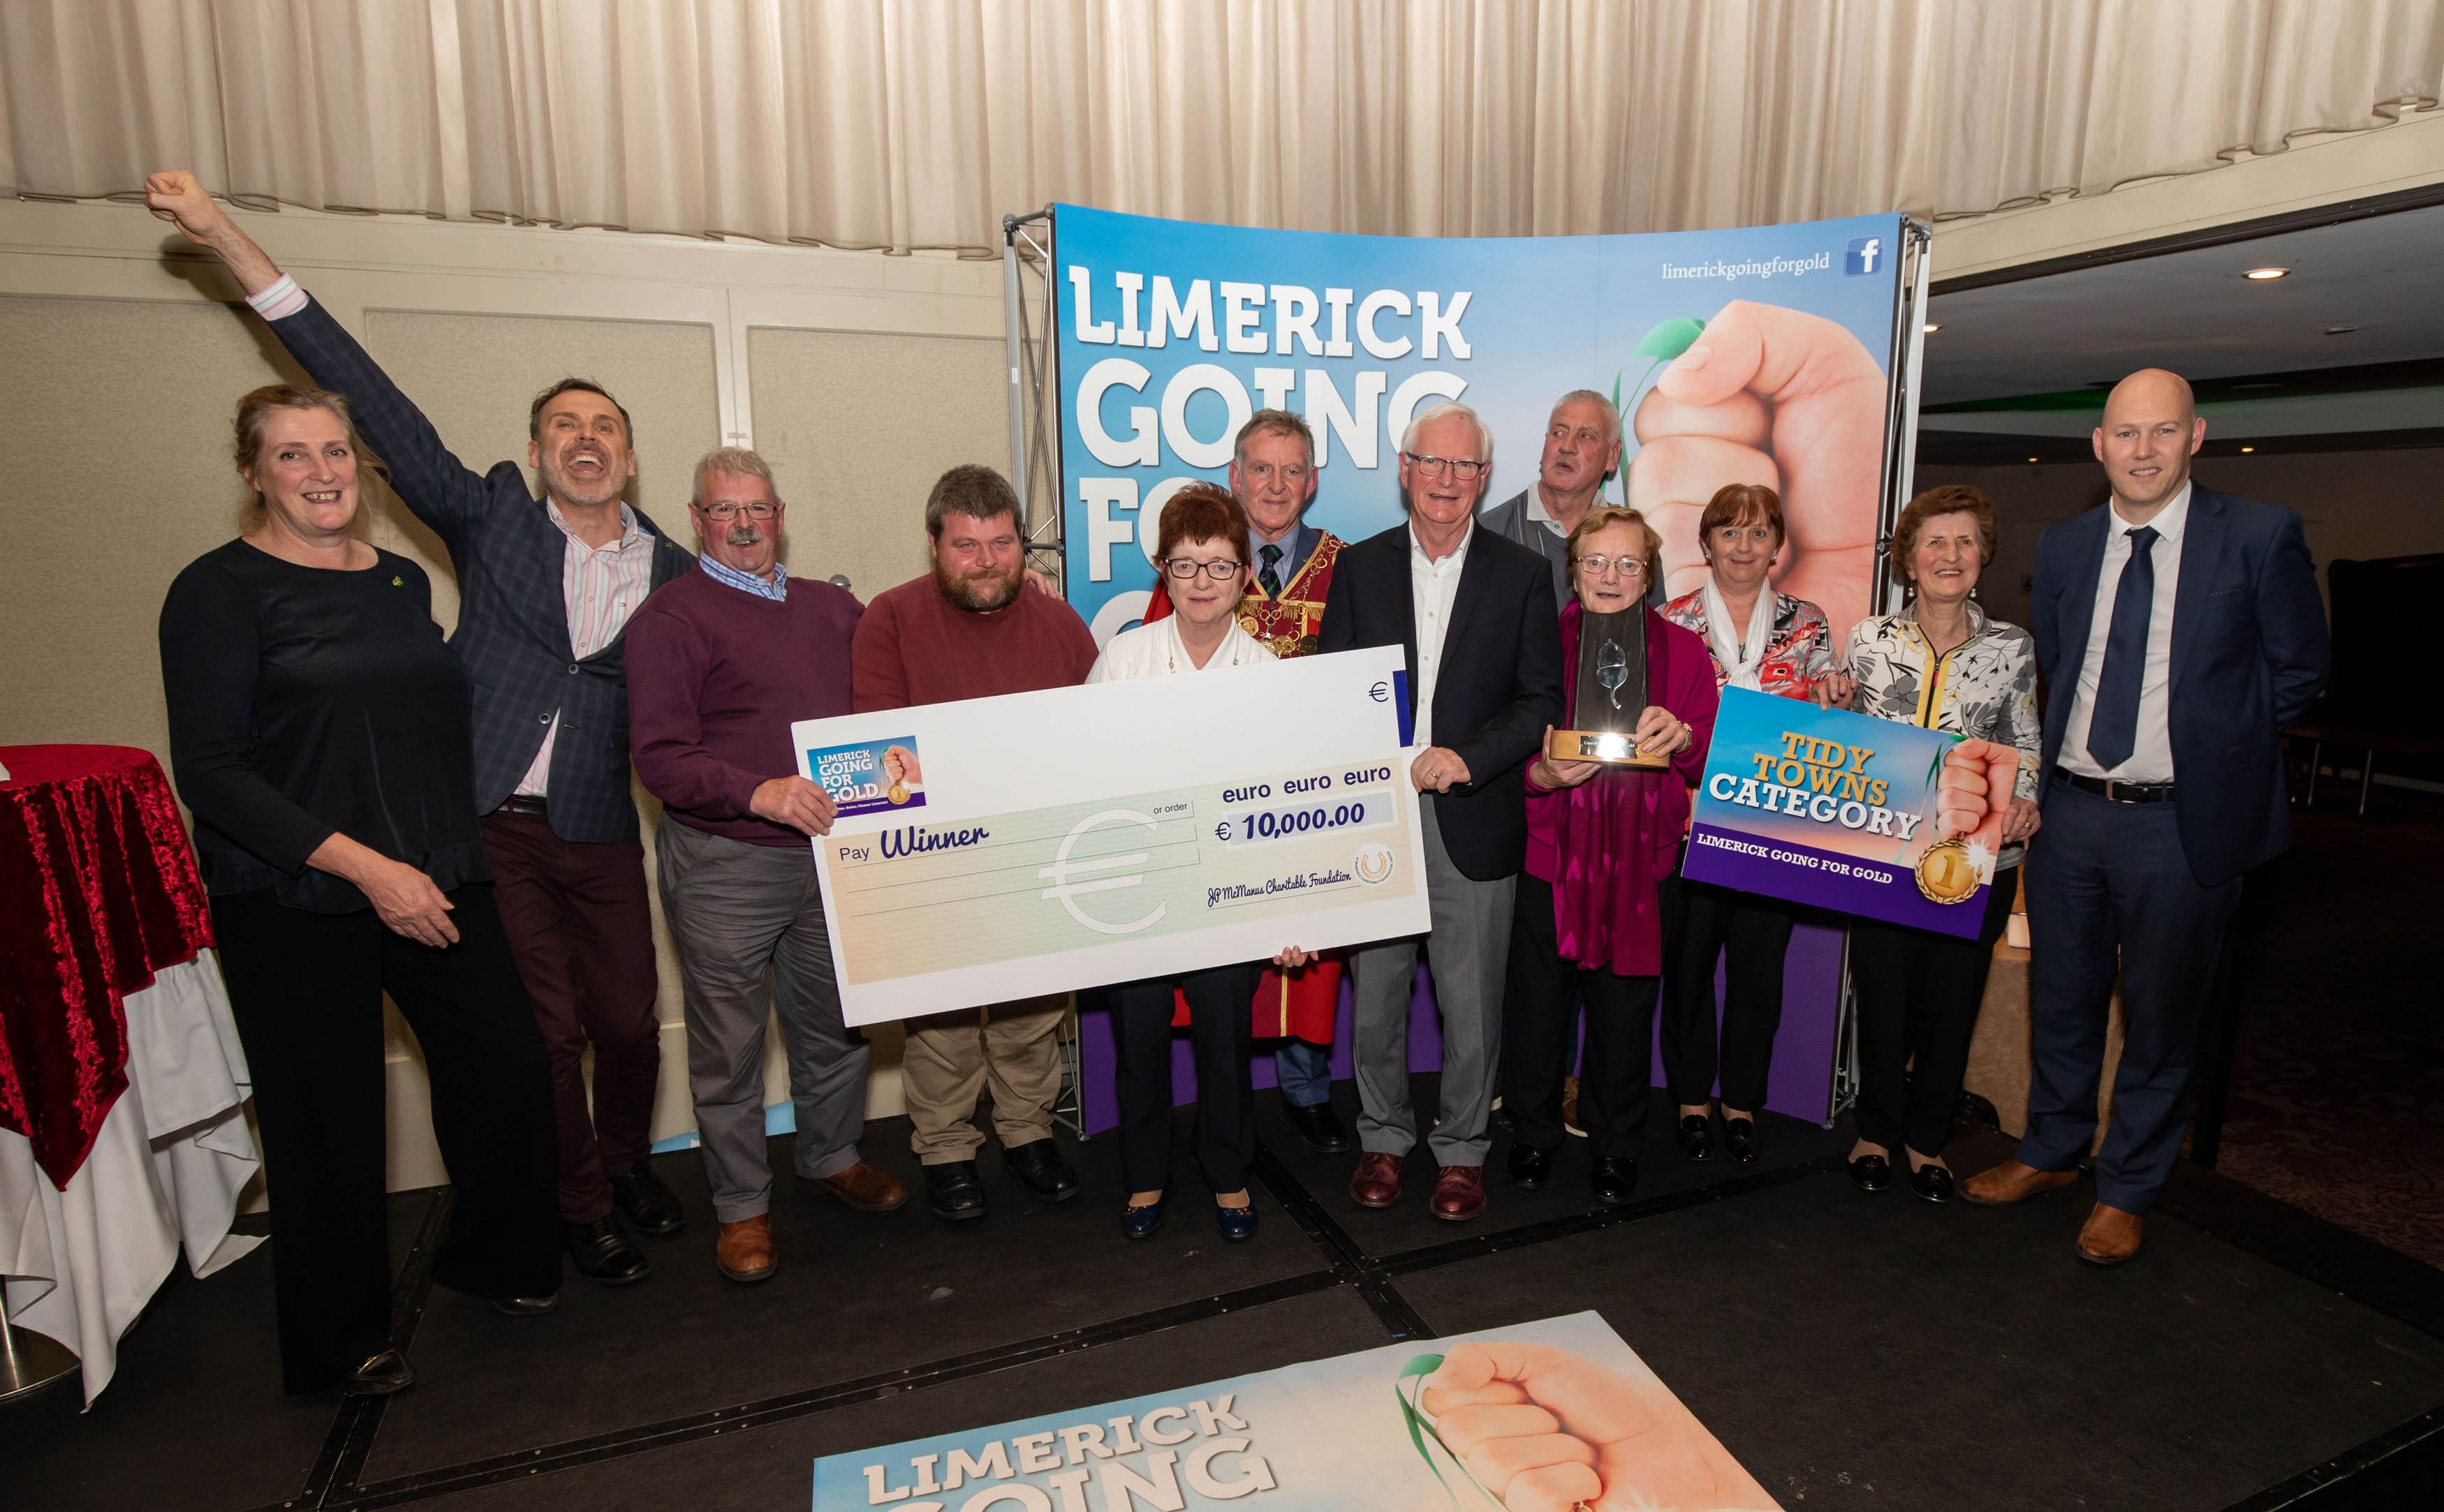 Limerick Going For Gold 2019 winners